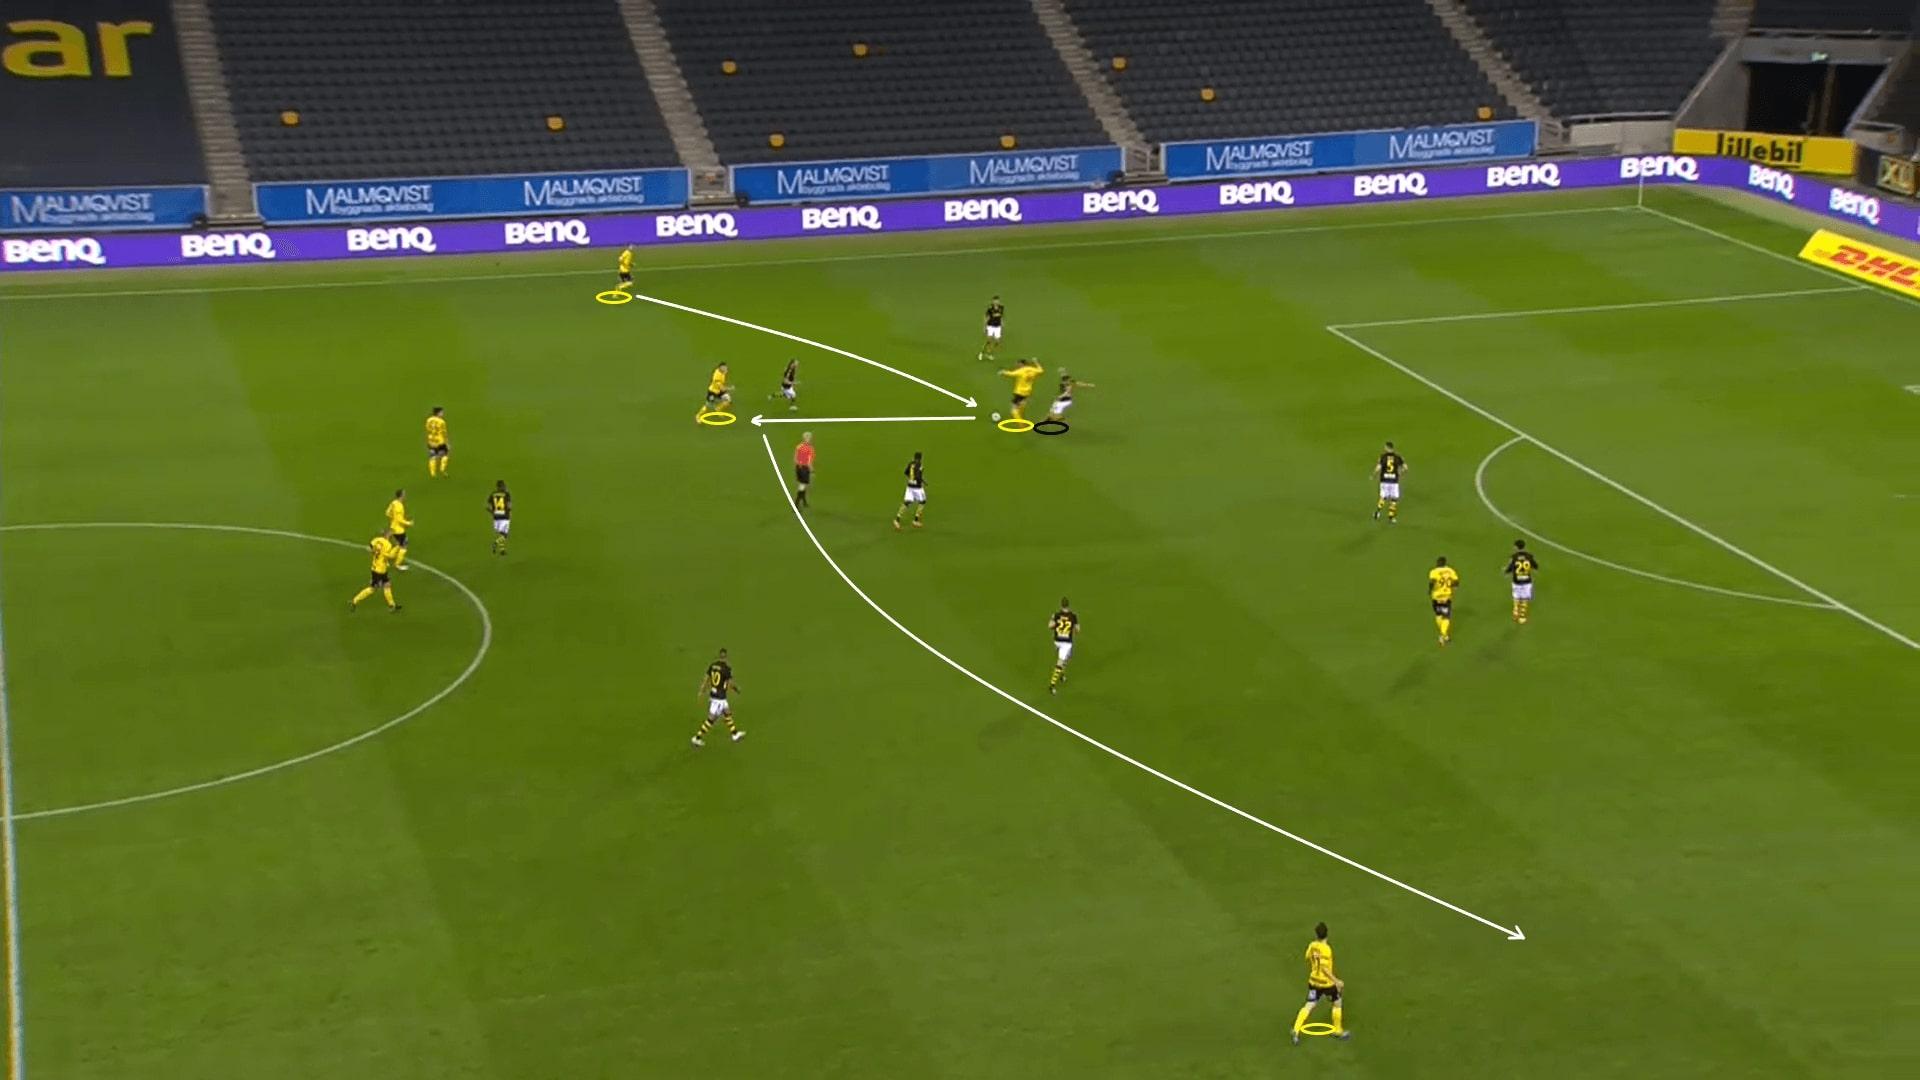 Allsvenskan 2020: AIK vs Mjallby AIF - tactical analysis - tactics